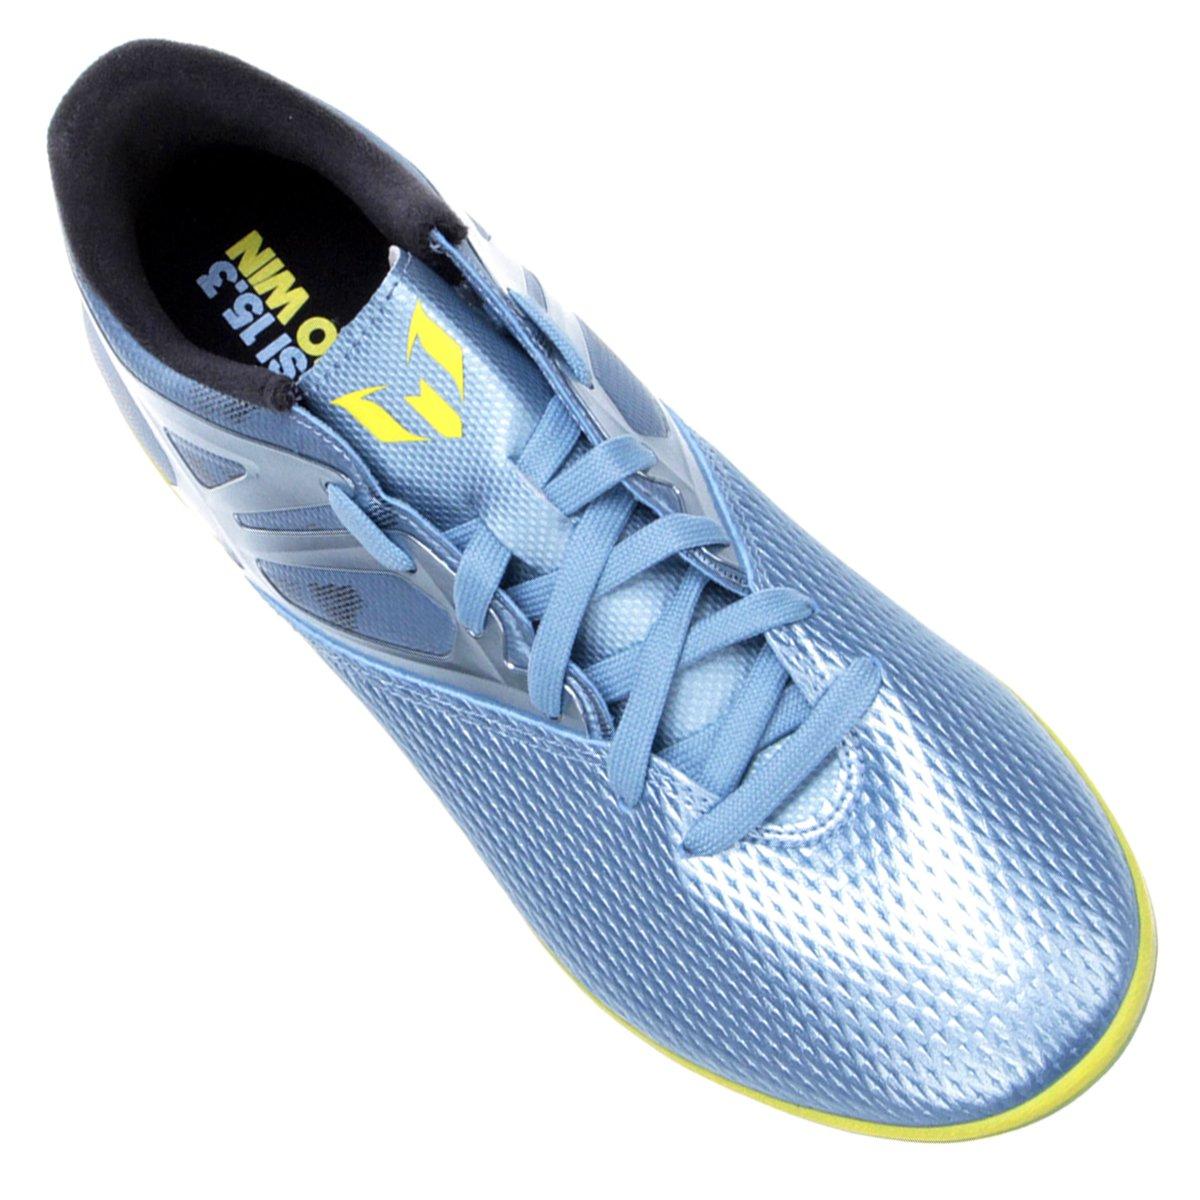 Chuteira Futsal Adidas Messi 15.3 IN Masculina - Compre Agora  c6261808e114d